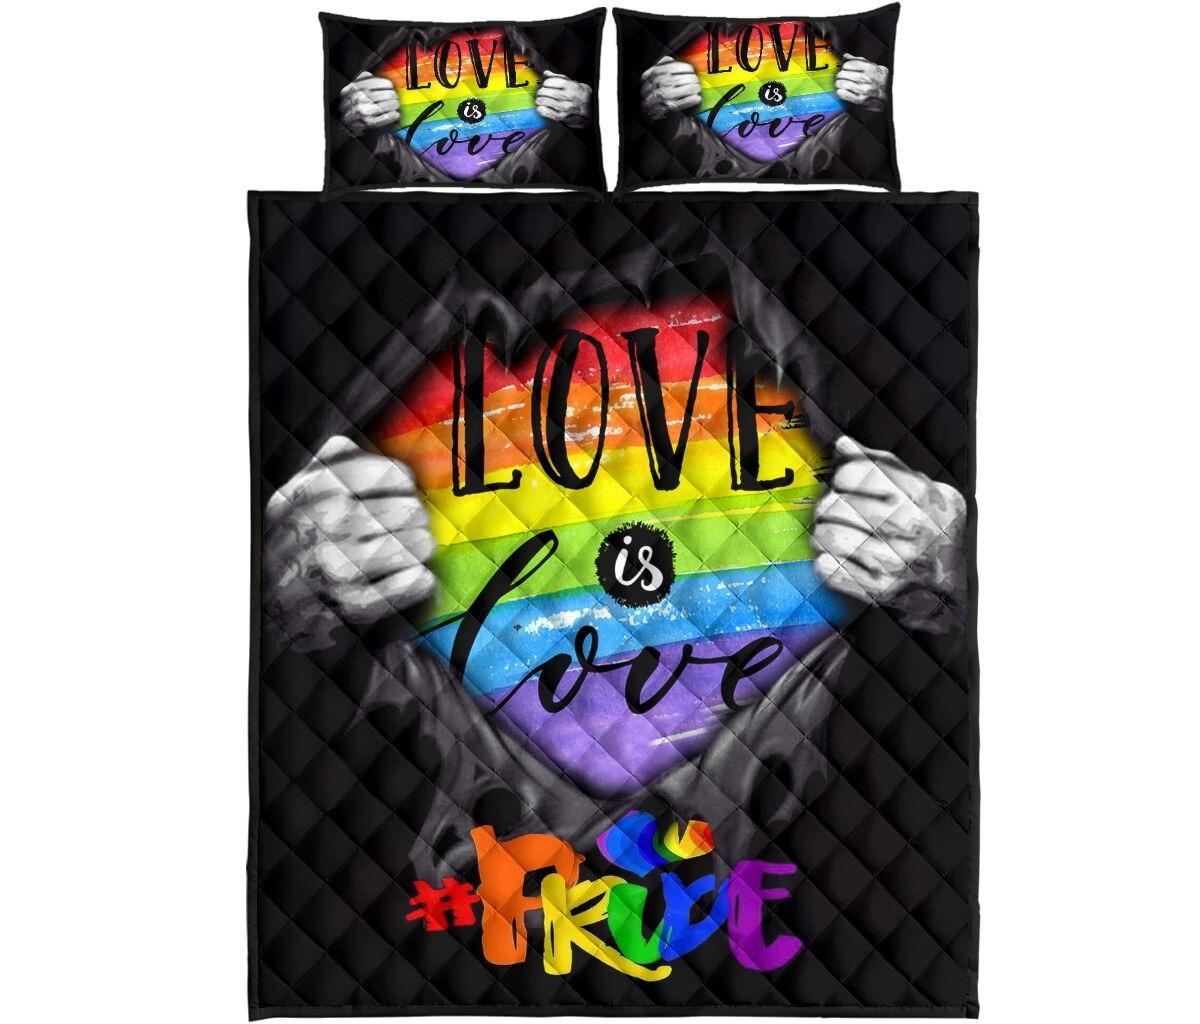 LGBT love is love quilt bedding set4